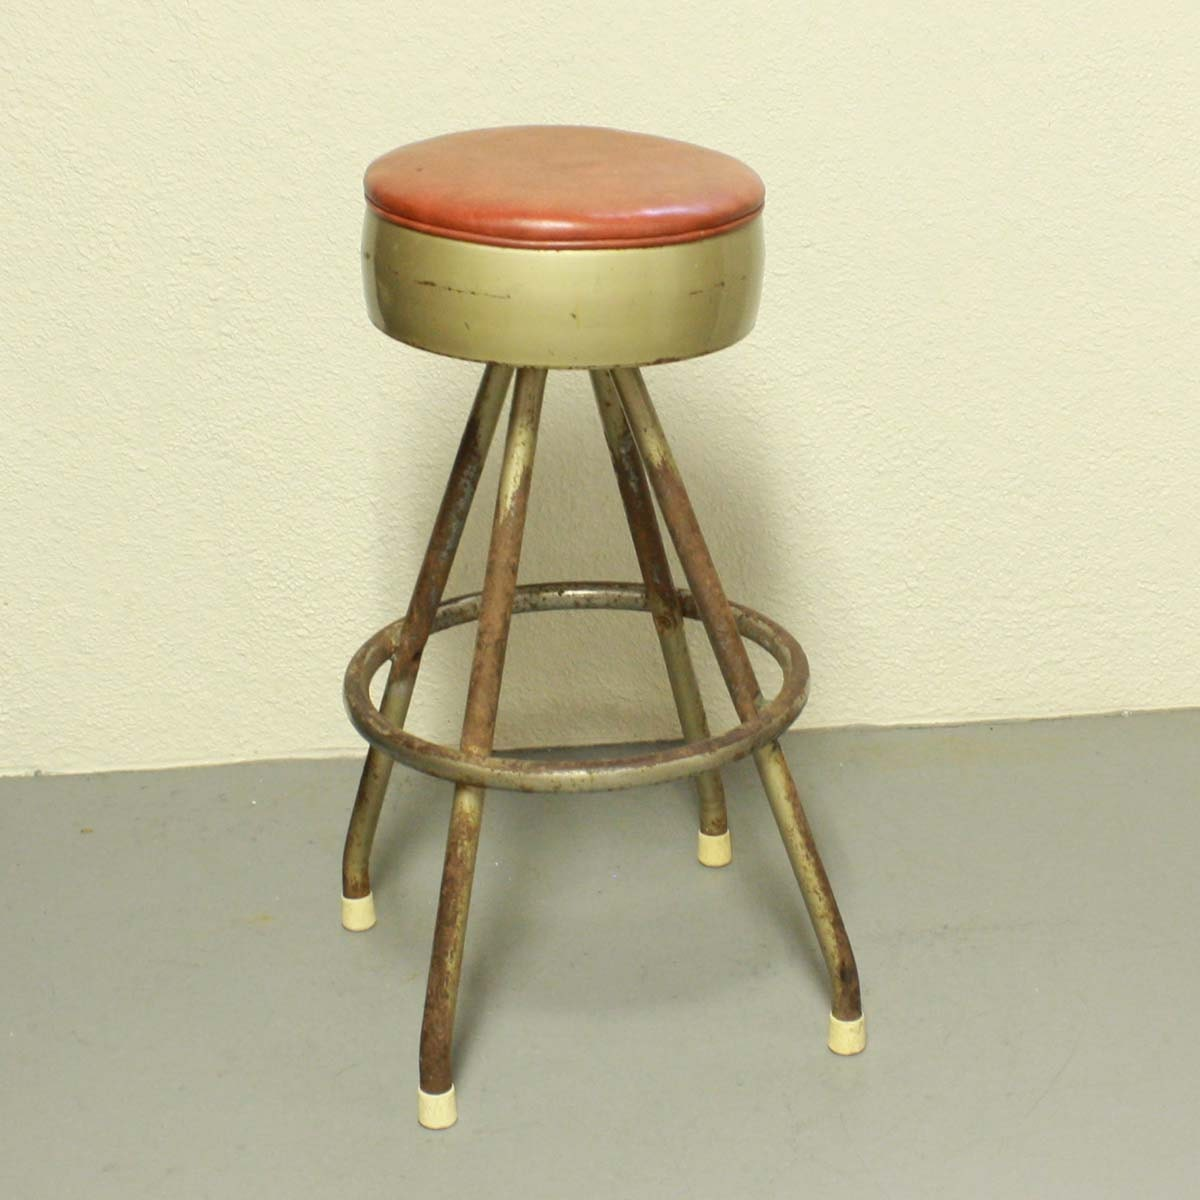 Vintage Stool Metal Seat Bar Stool Swivel Vitro